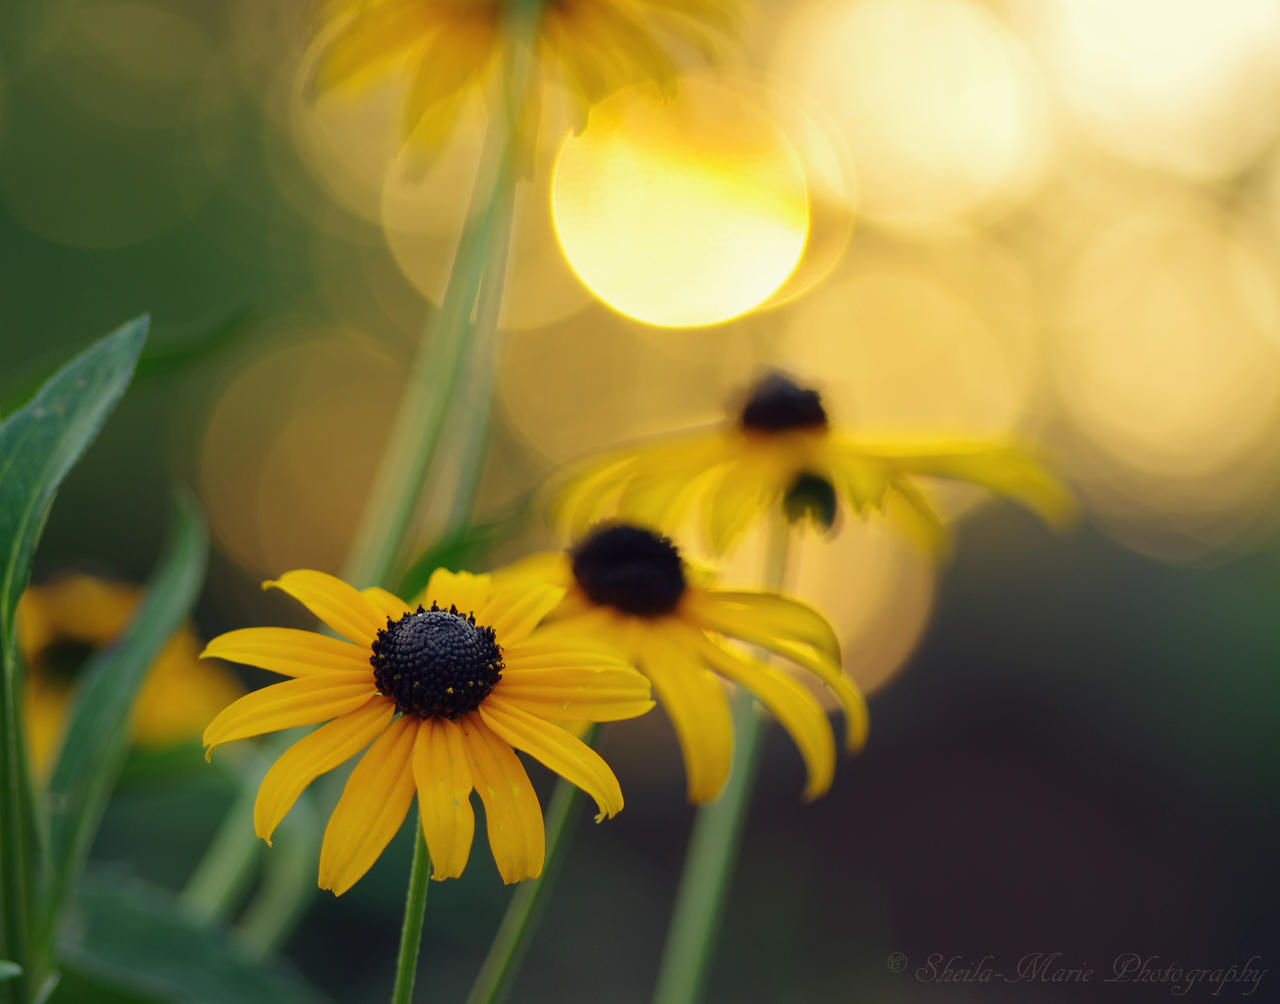 Sundown Susan by SharingMyDreams